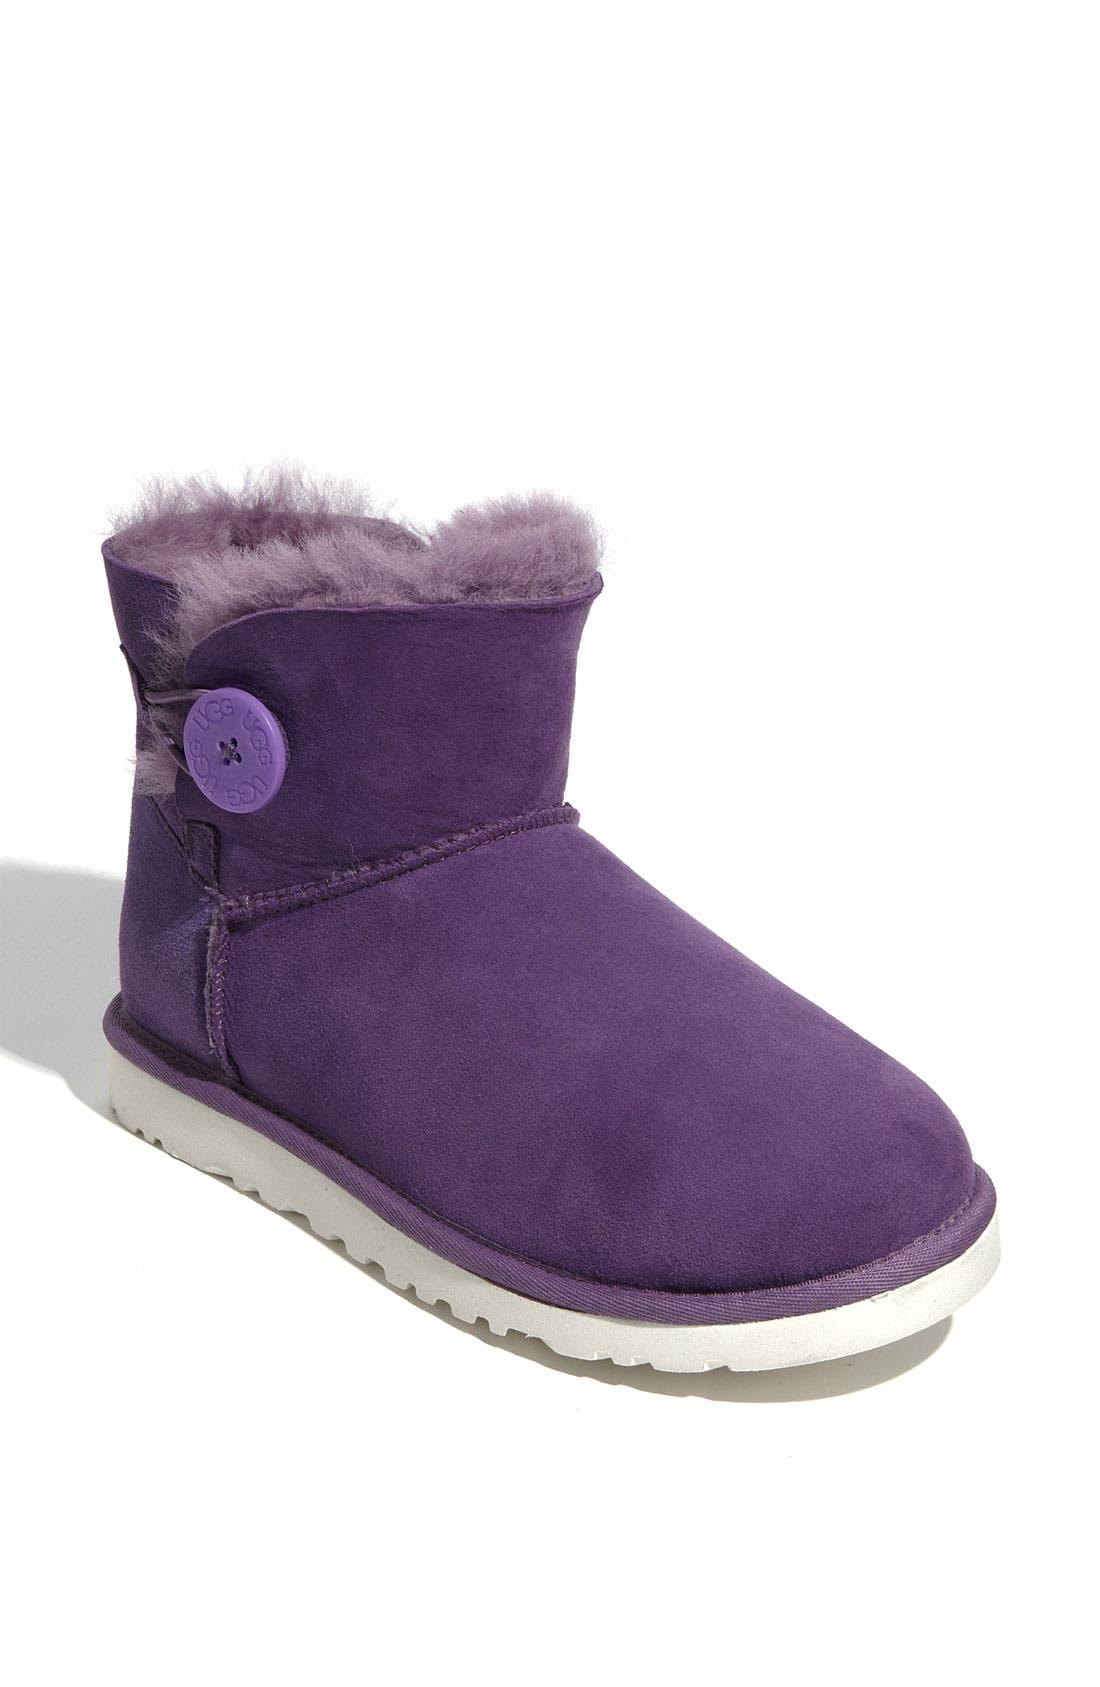 Main Image - UGG® 'Mini Bailey Button' Boot (Women)